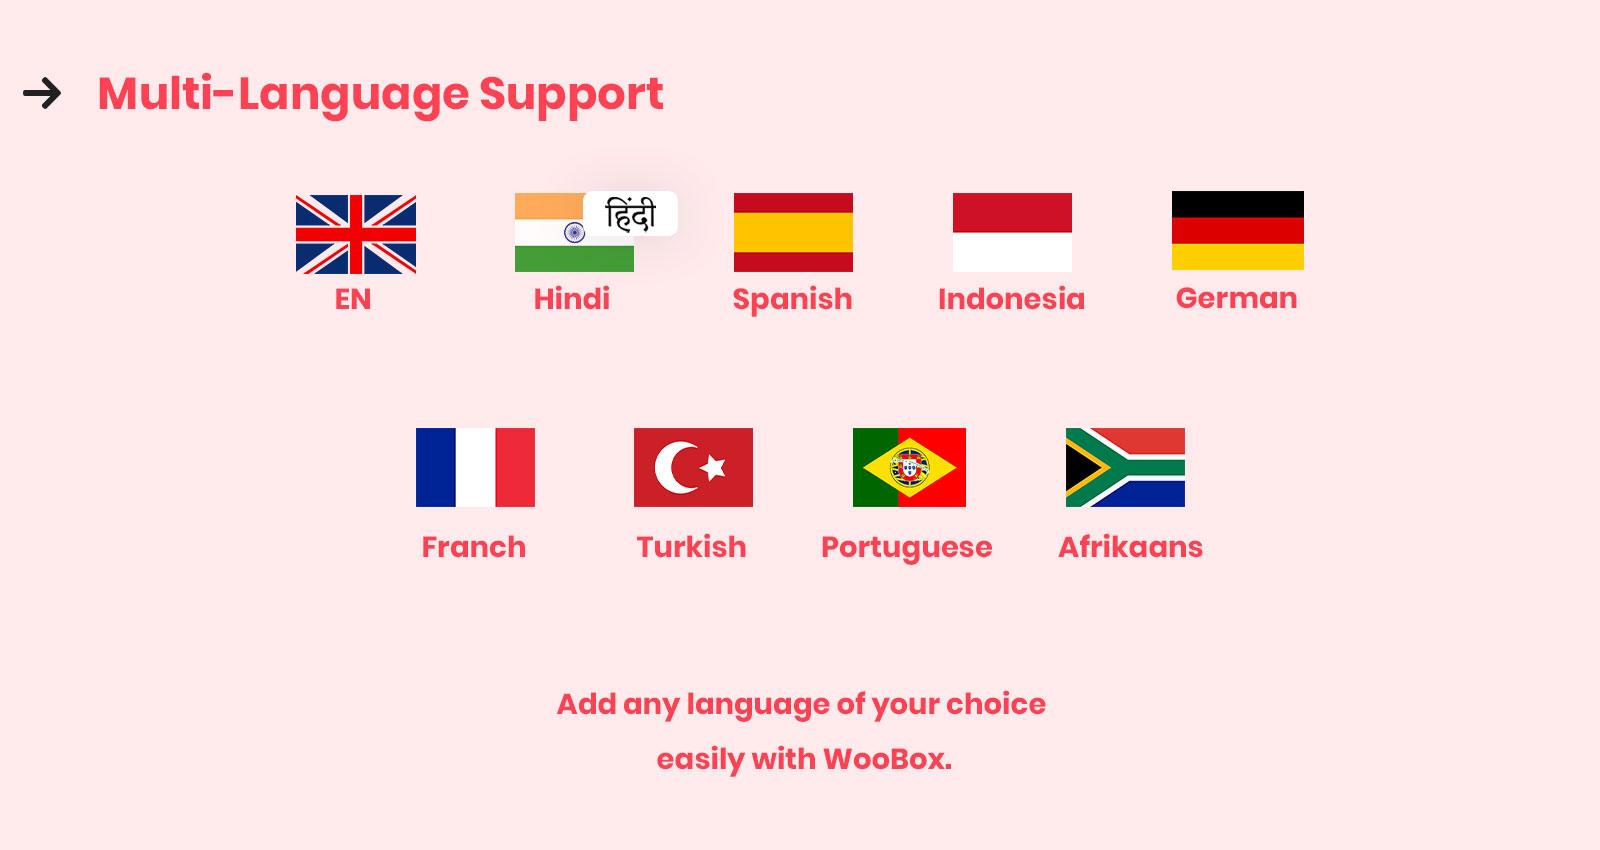 سورس اپليكيشن فروشگاهي WooBox 6